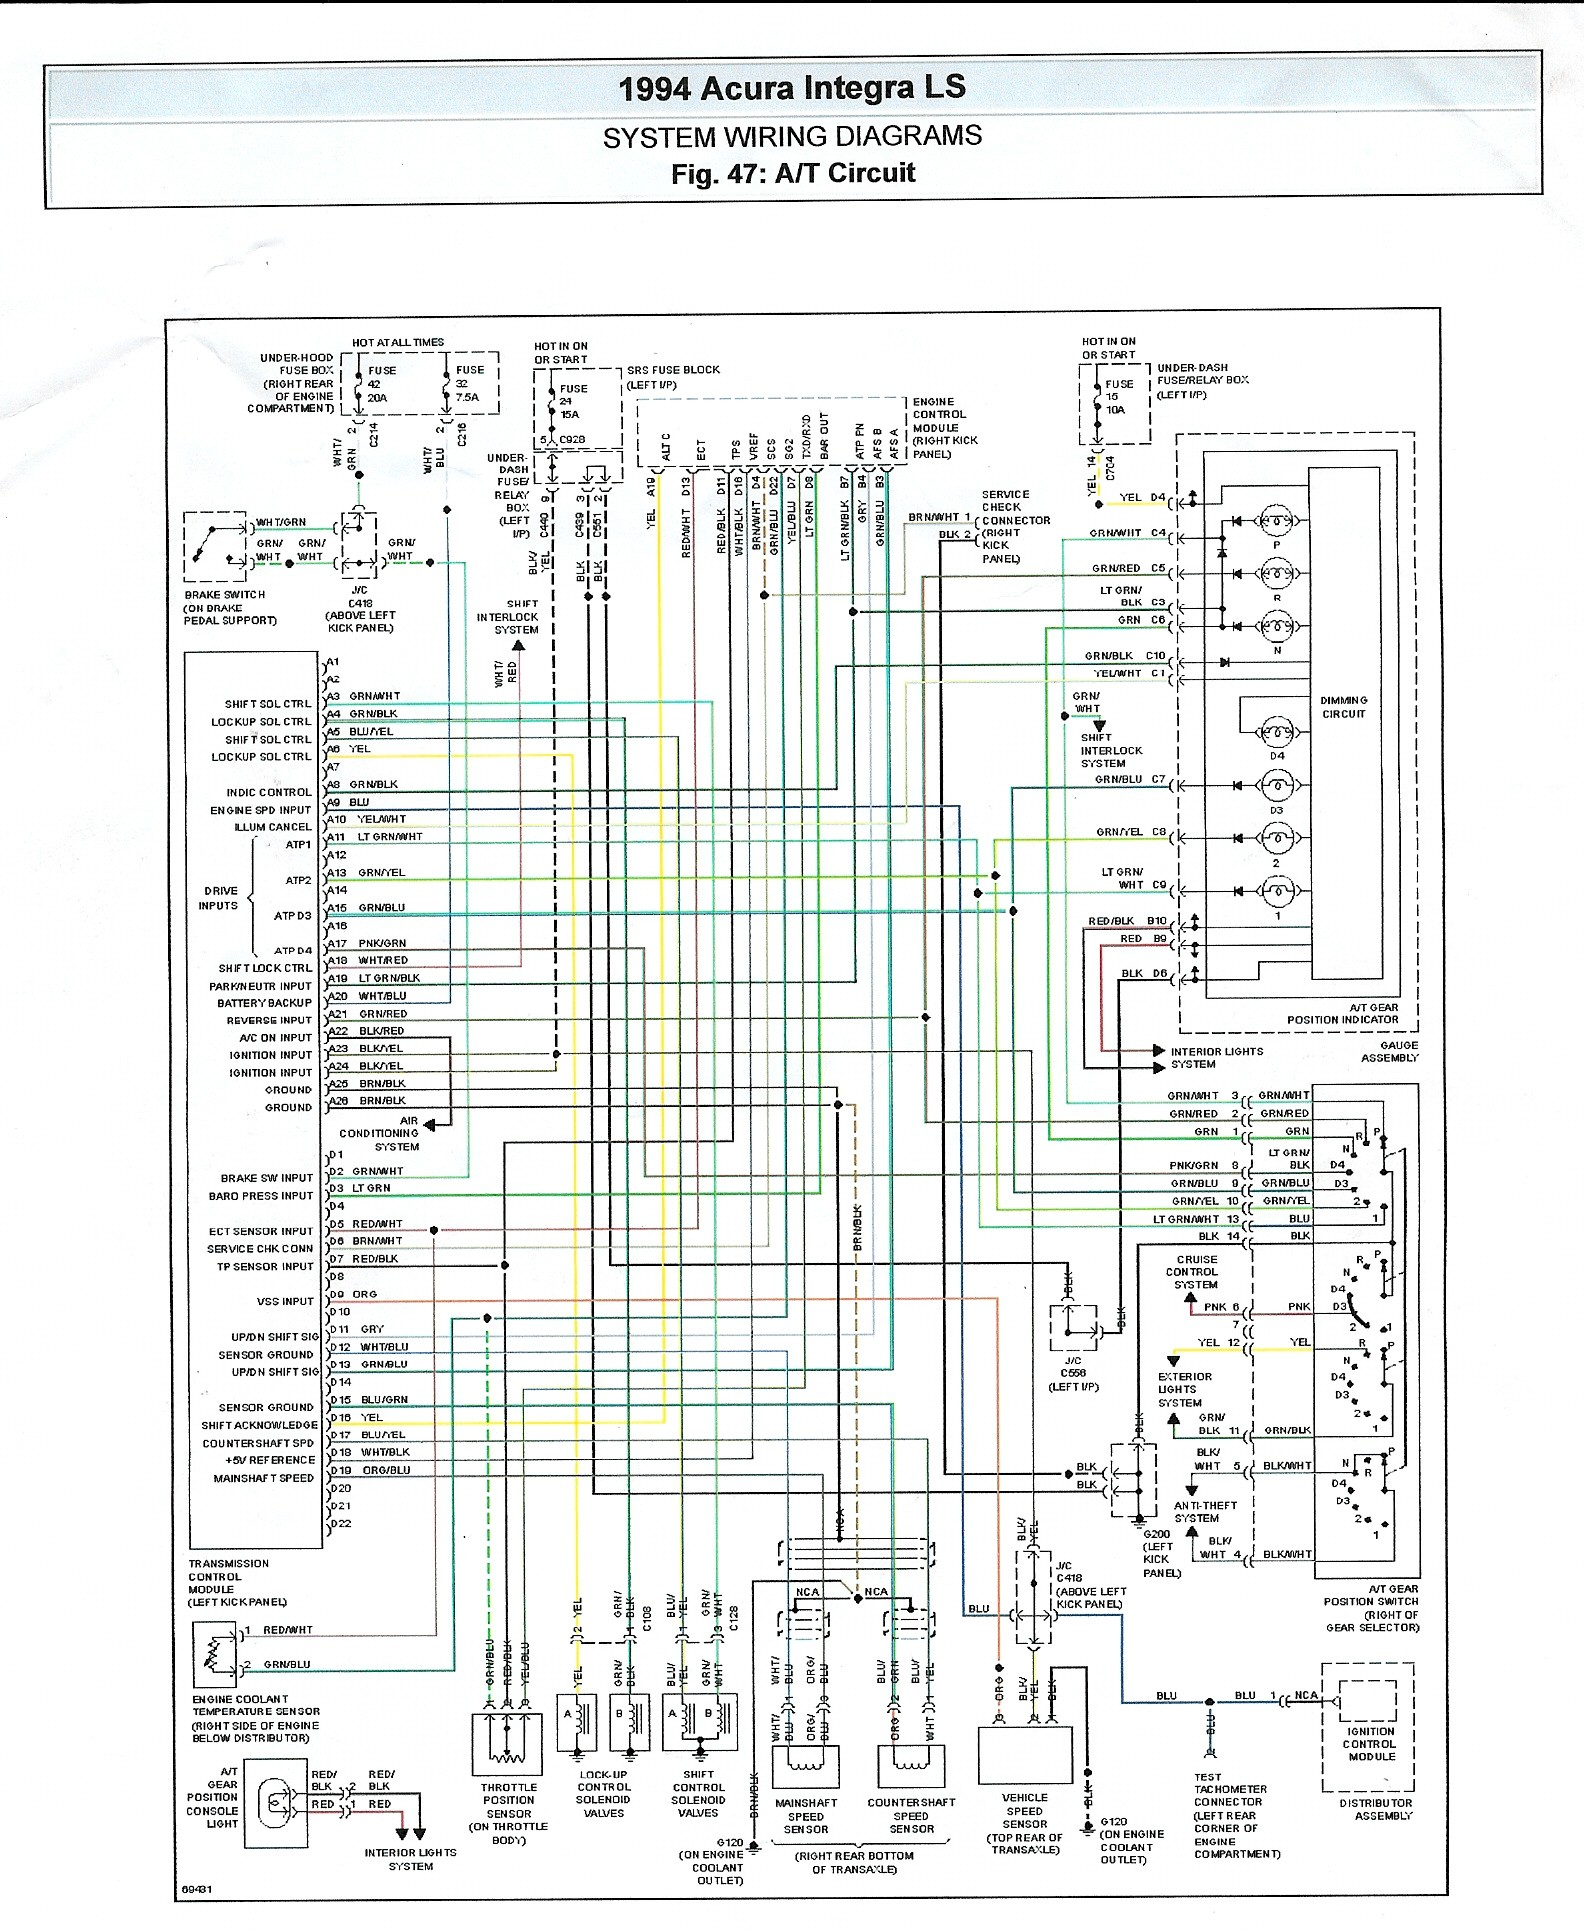 1999 Honda Civic Engine    Diagram      My    Wiring       DIagram